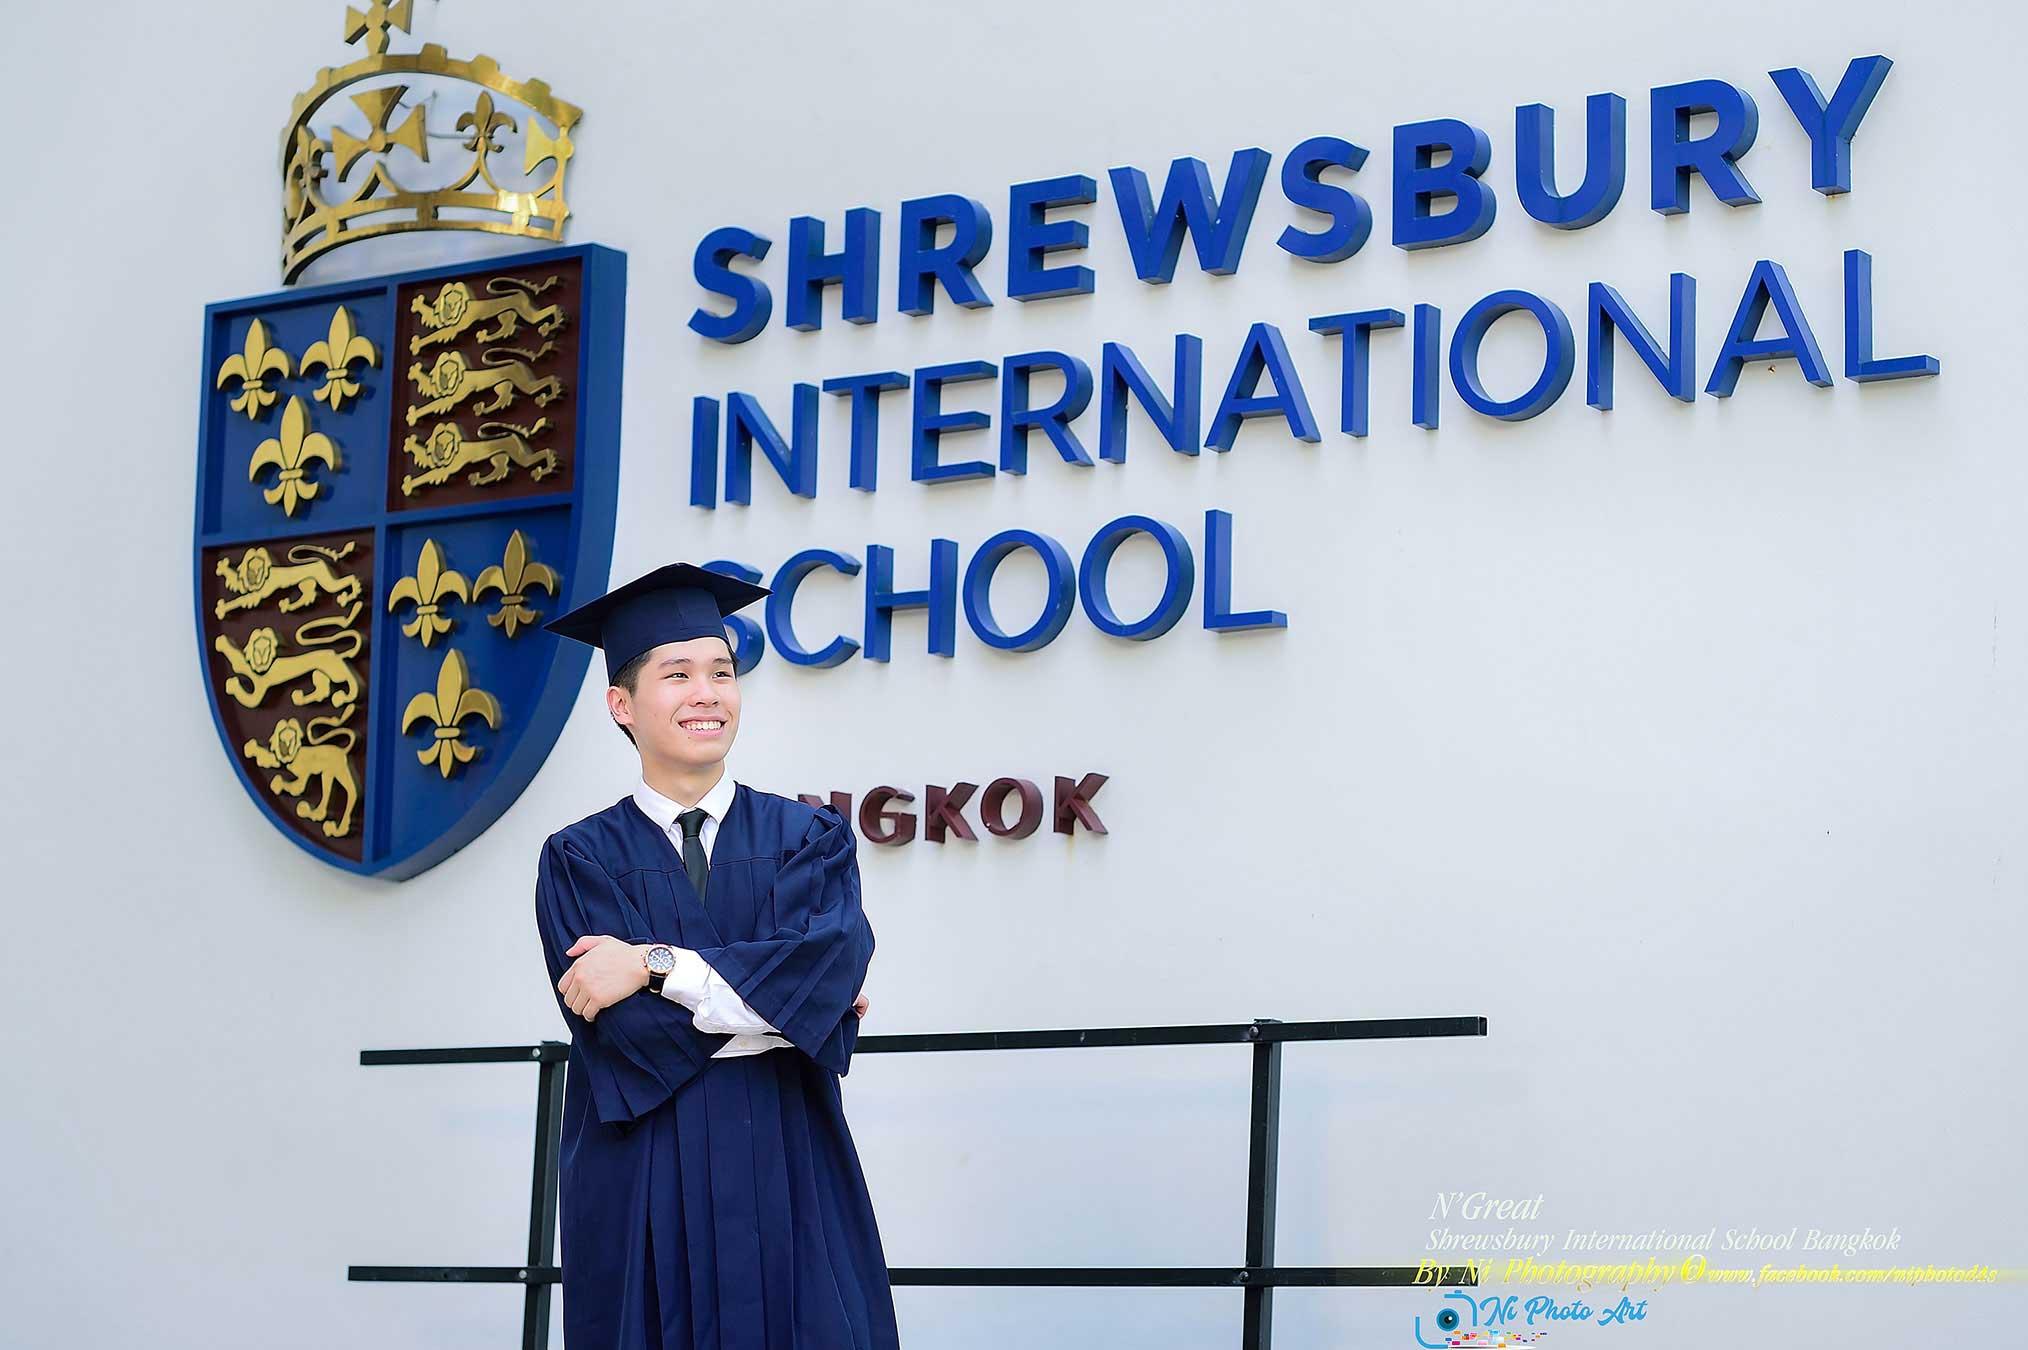 N'Graet Graduation Caremony @ Shrewsbury International School